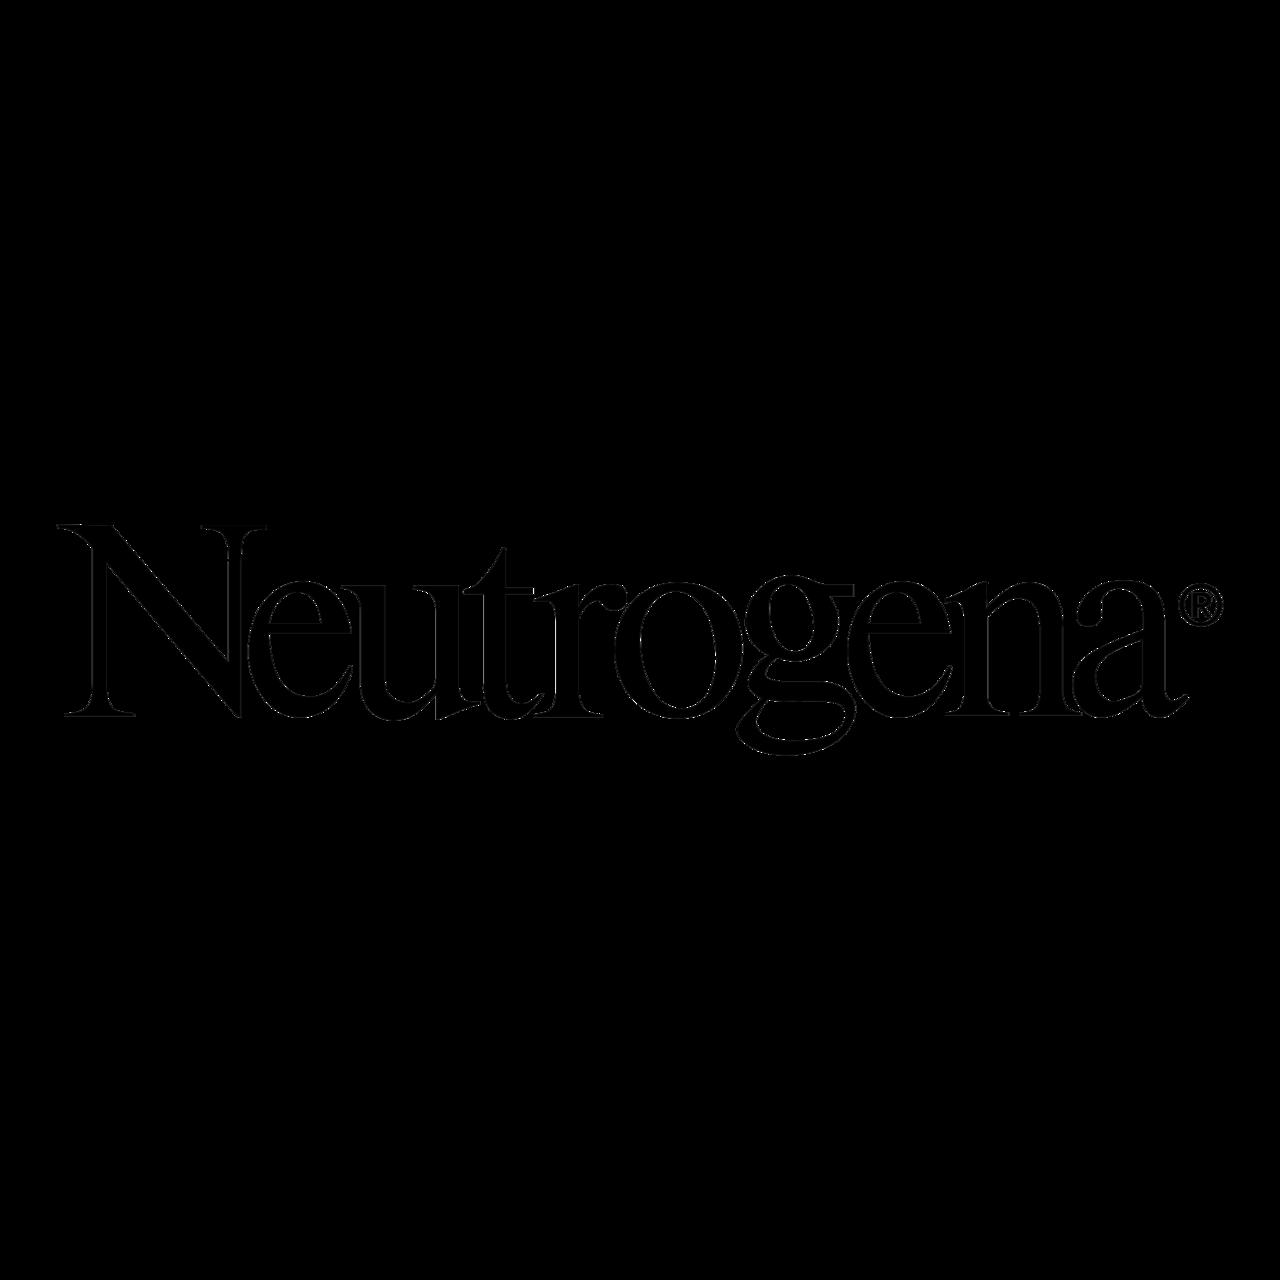 نیتروژنا لوگو